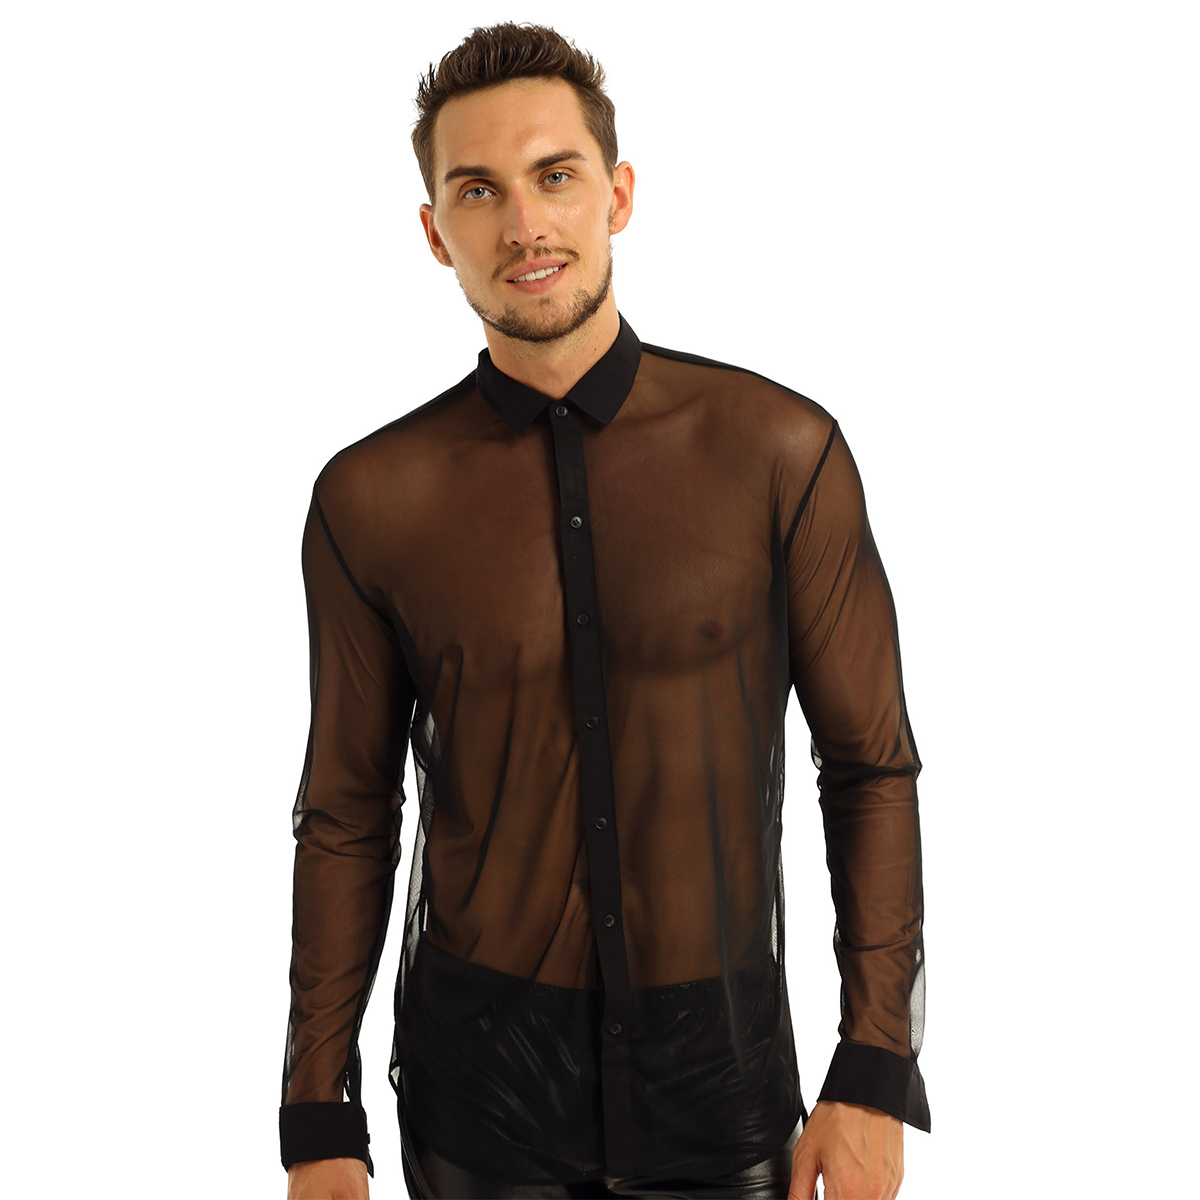 Image 3 - iiniim Mens Fashion See Through Mesh Long Sleeve Clubwear Turn down Collar Top Shirt for Club Evening Party WetLook Shirtsf shirtsfashion shirtsee through shirts -